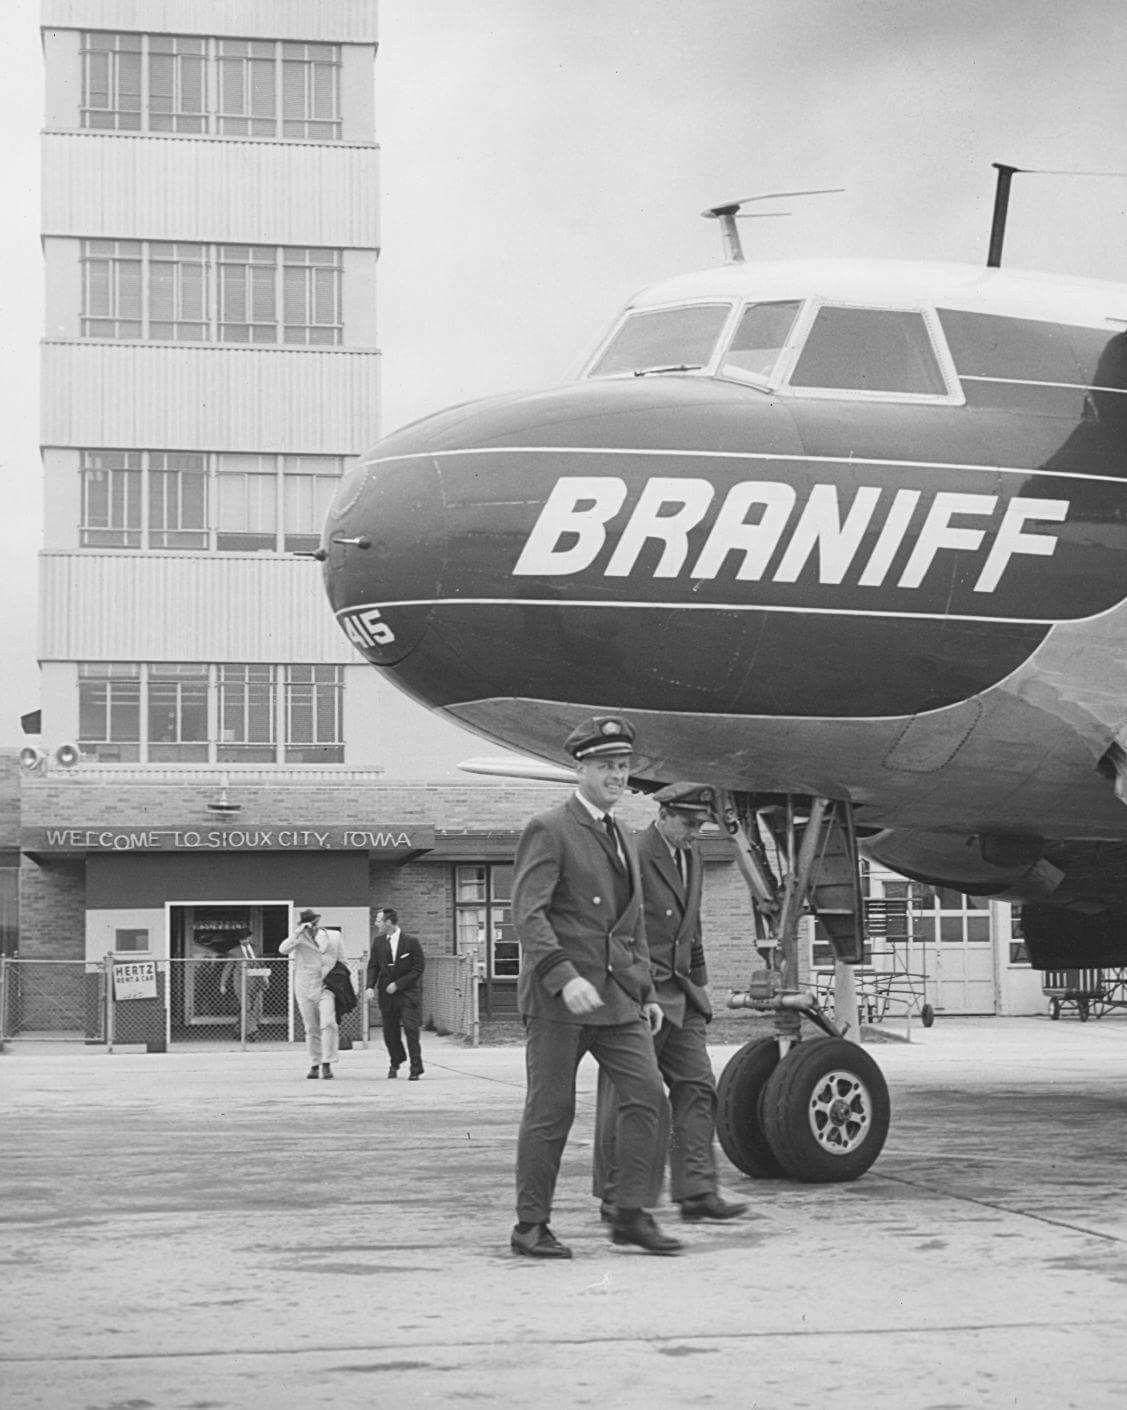 Braniff International Airways Convair Cv 340 42 Super B Liner Tail Number N3415 At Sioux Gateway Airport Vintage Aircraft Airlines Branding Vintage Airlines